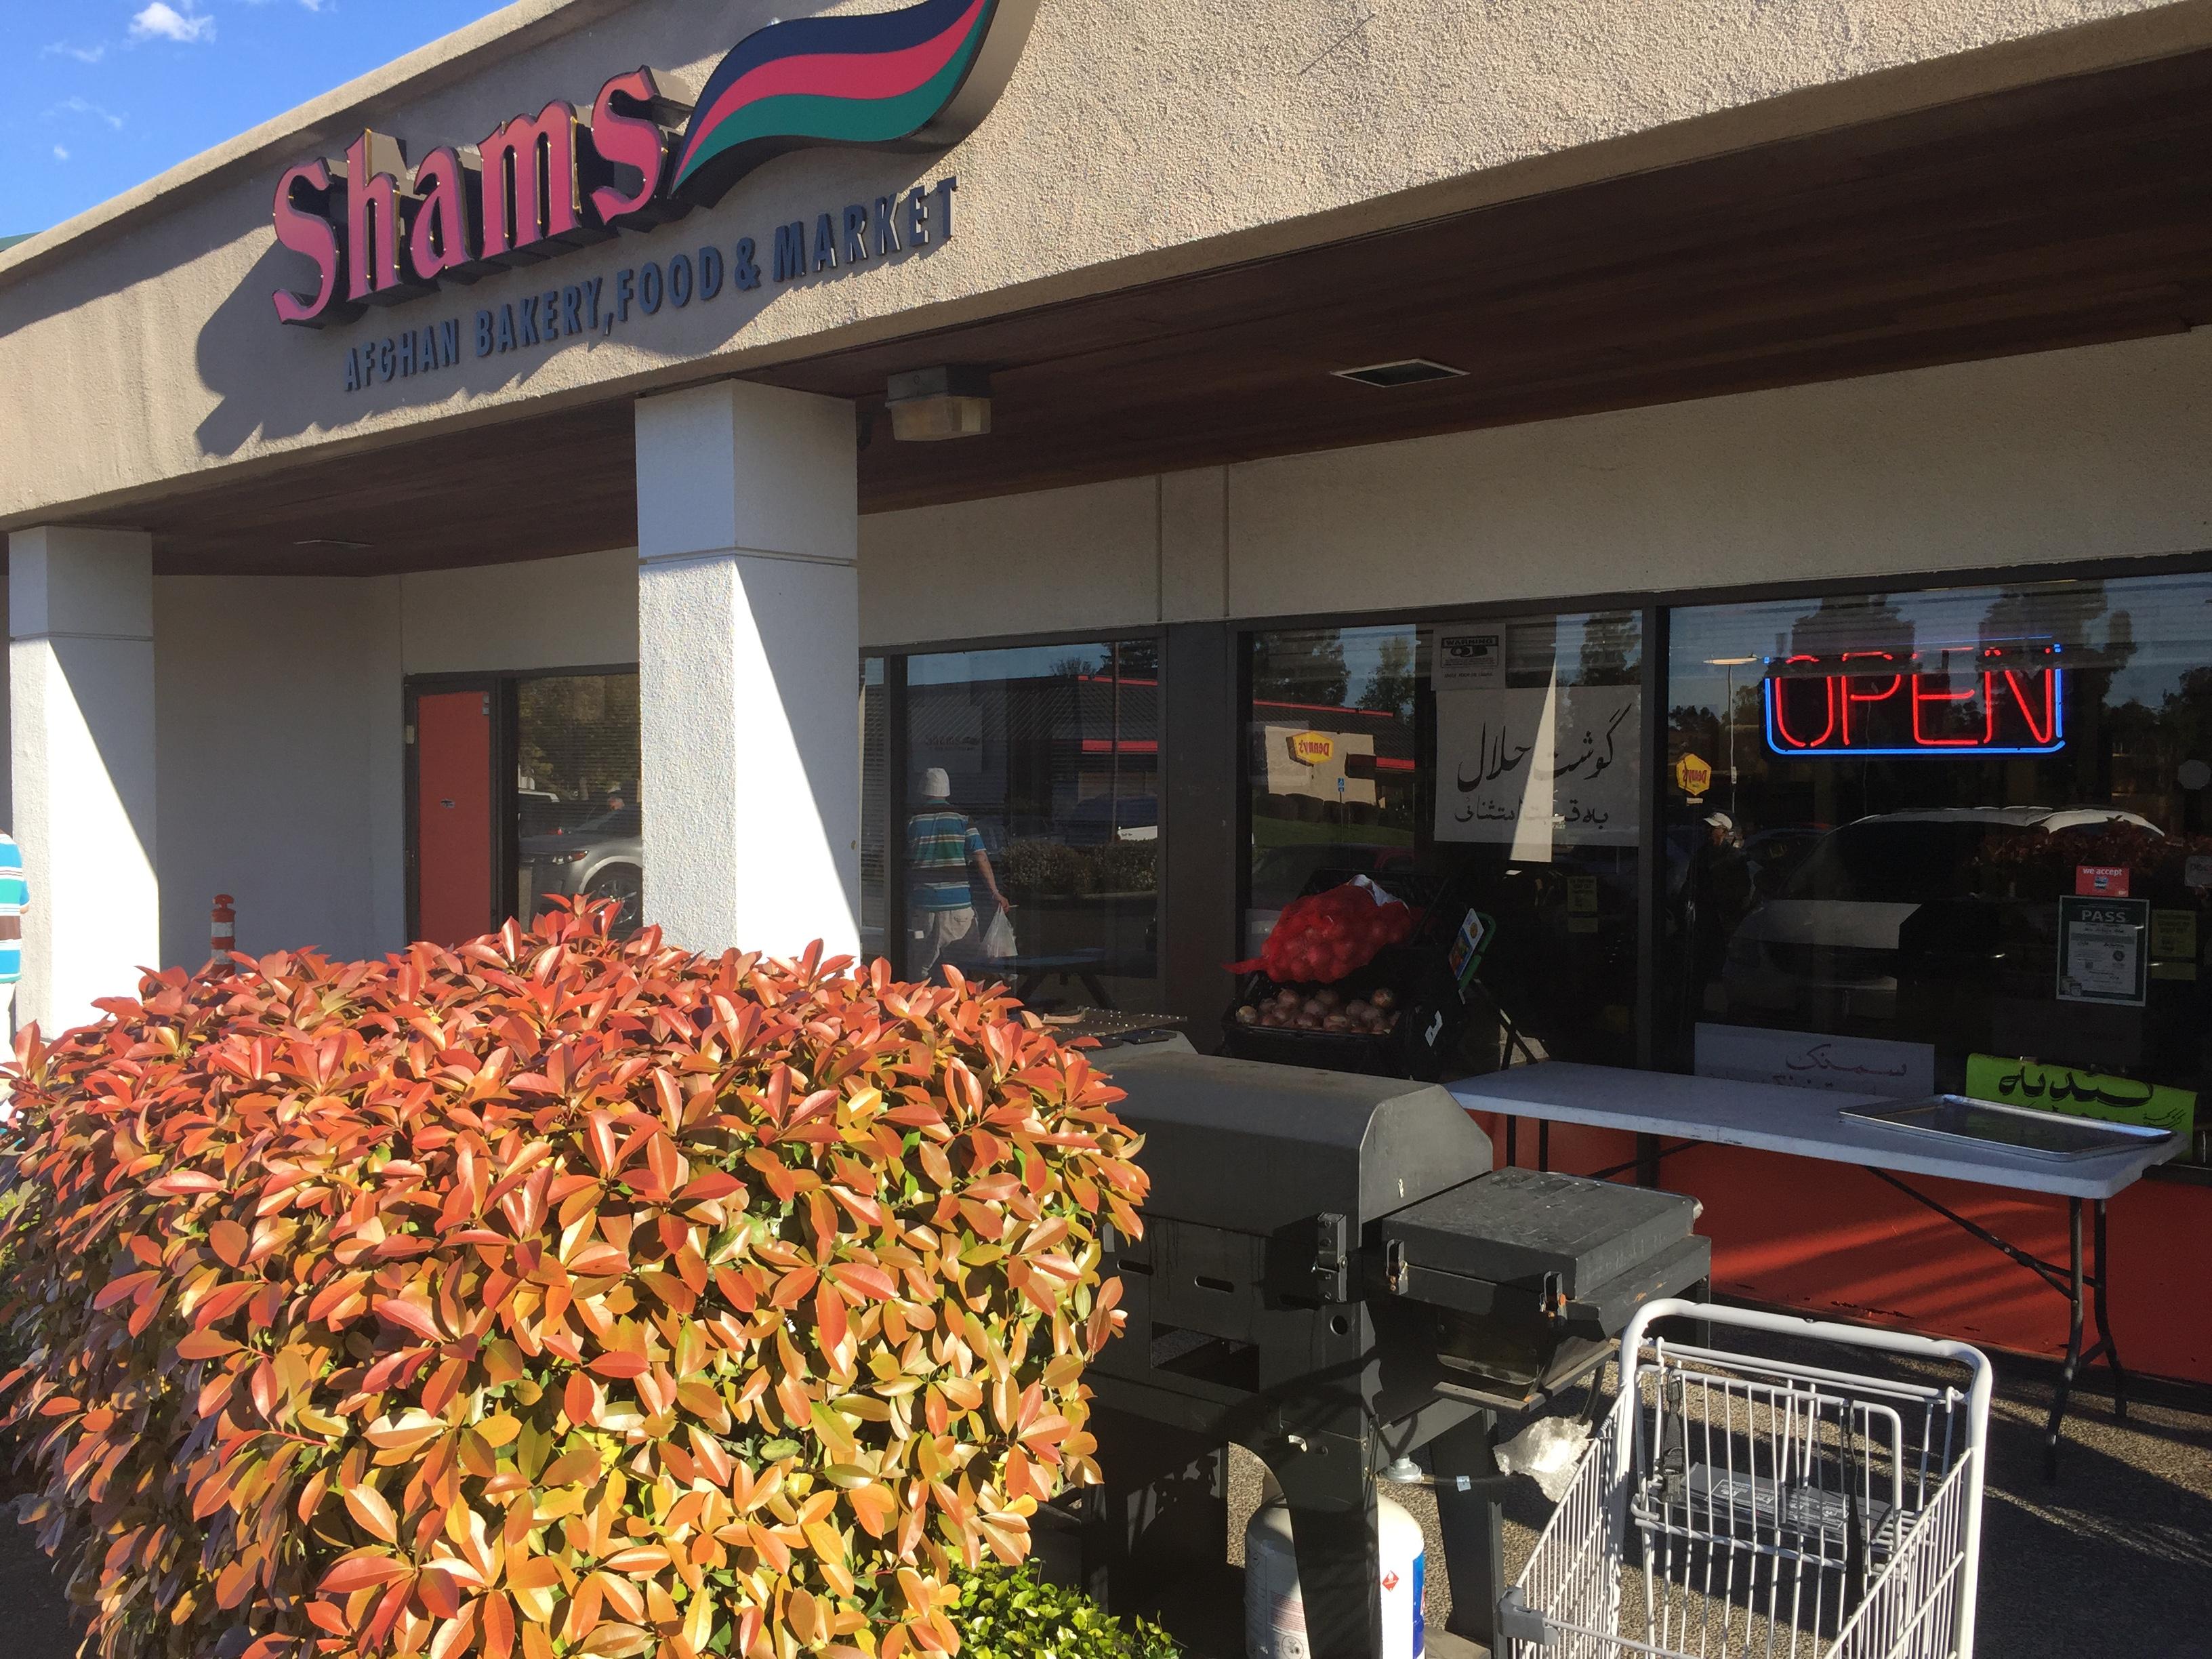 Shams Market 3510 Auburn Blvd Sacramento Ca 95821 Yp Com